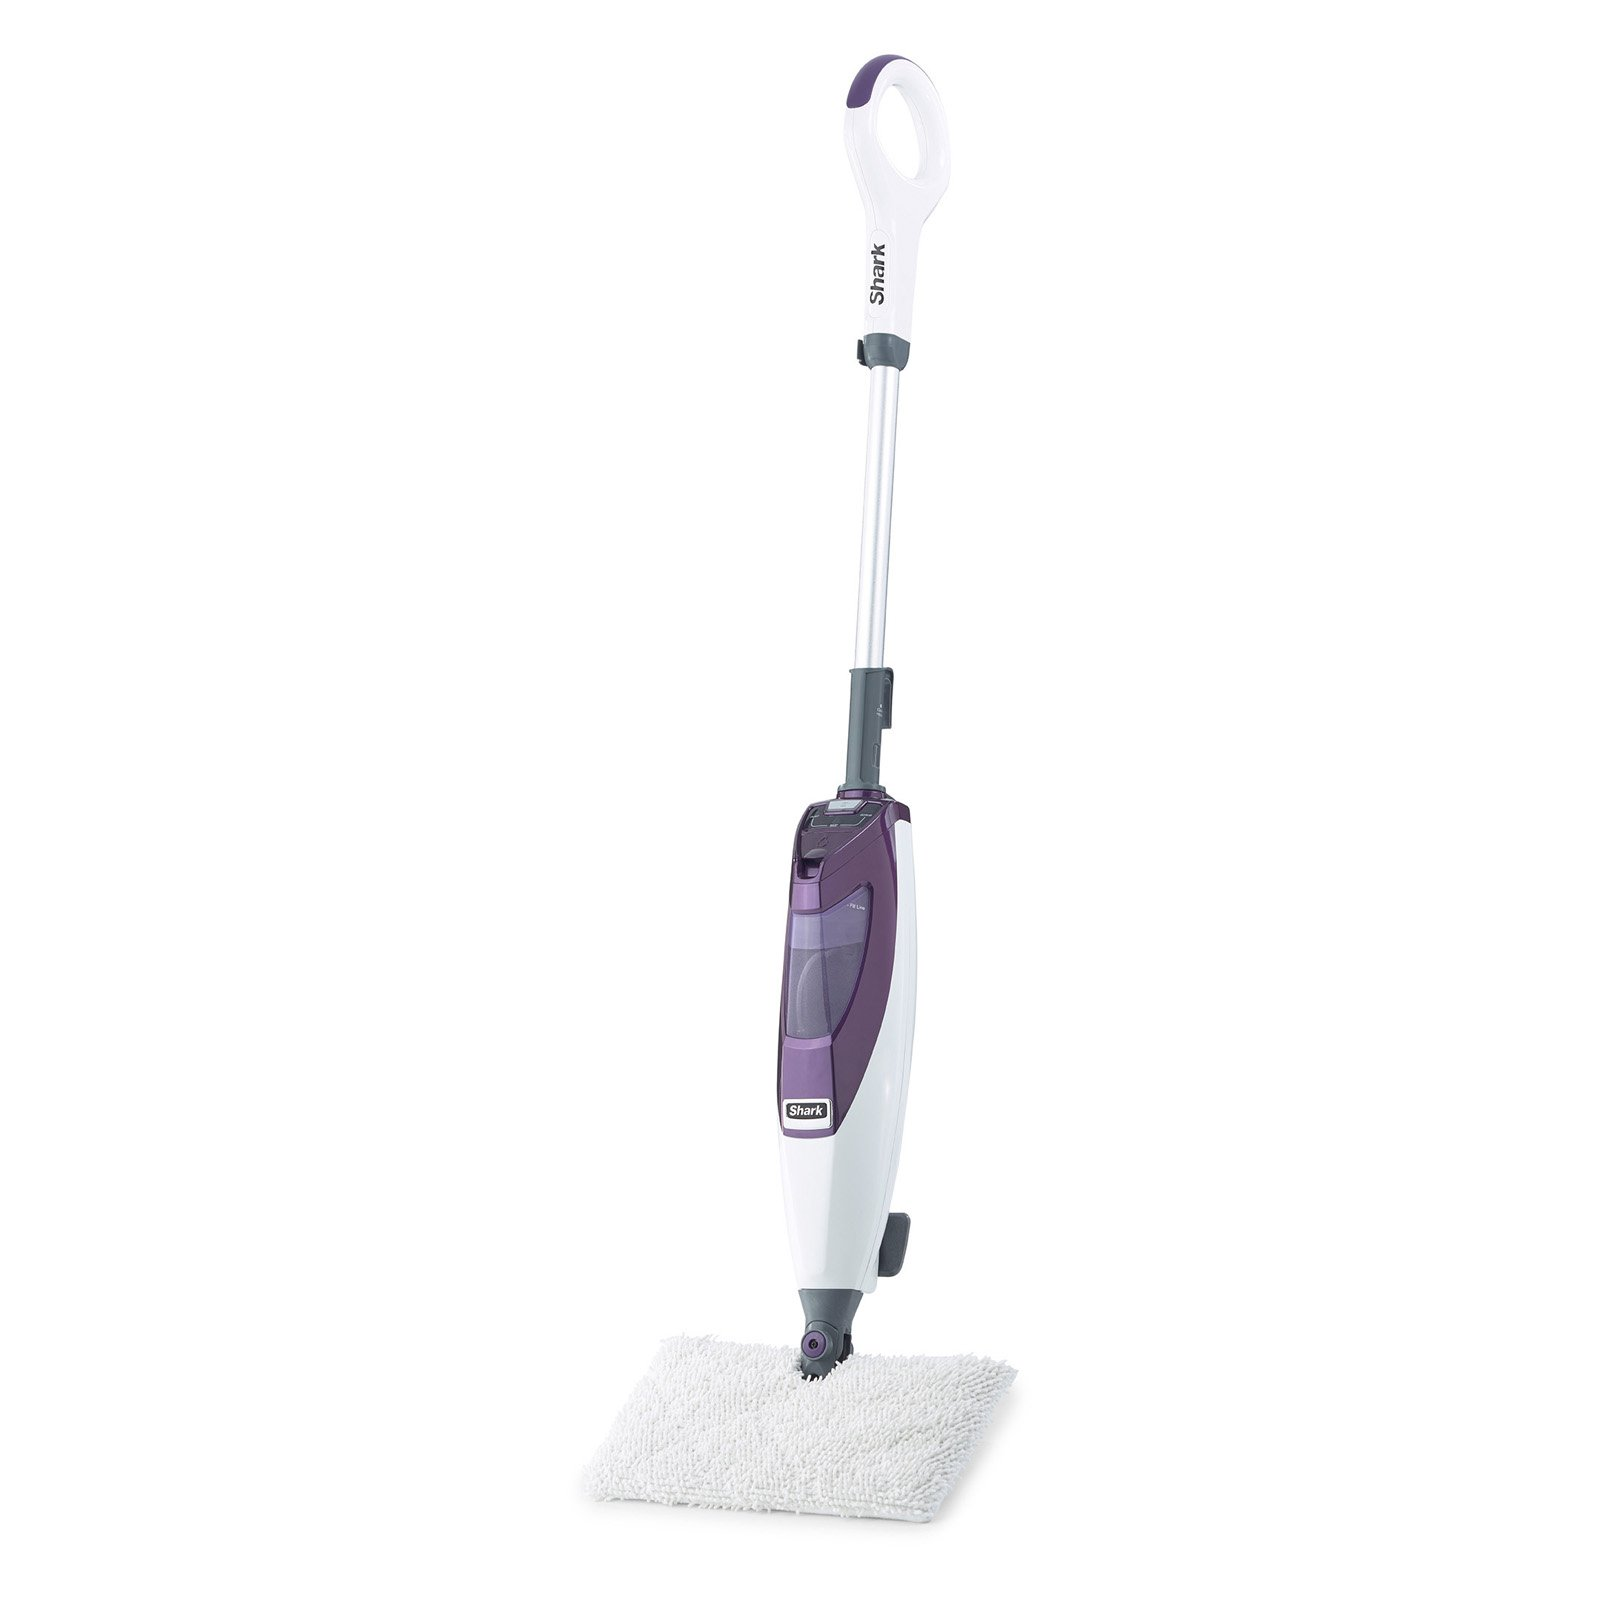 Shark Shark Blast and Scrub Steam Pocket Mop, White/Purpl...